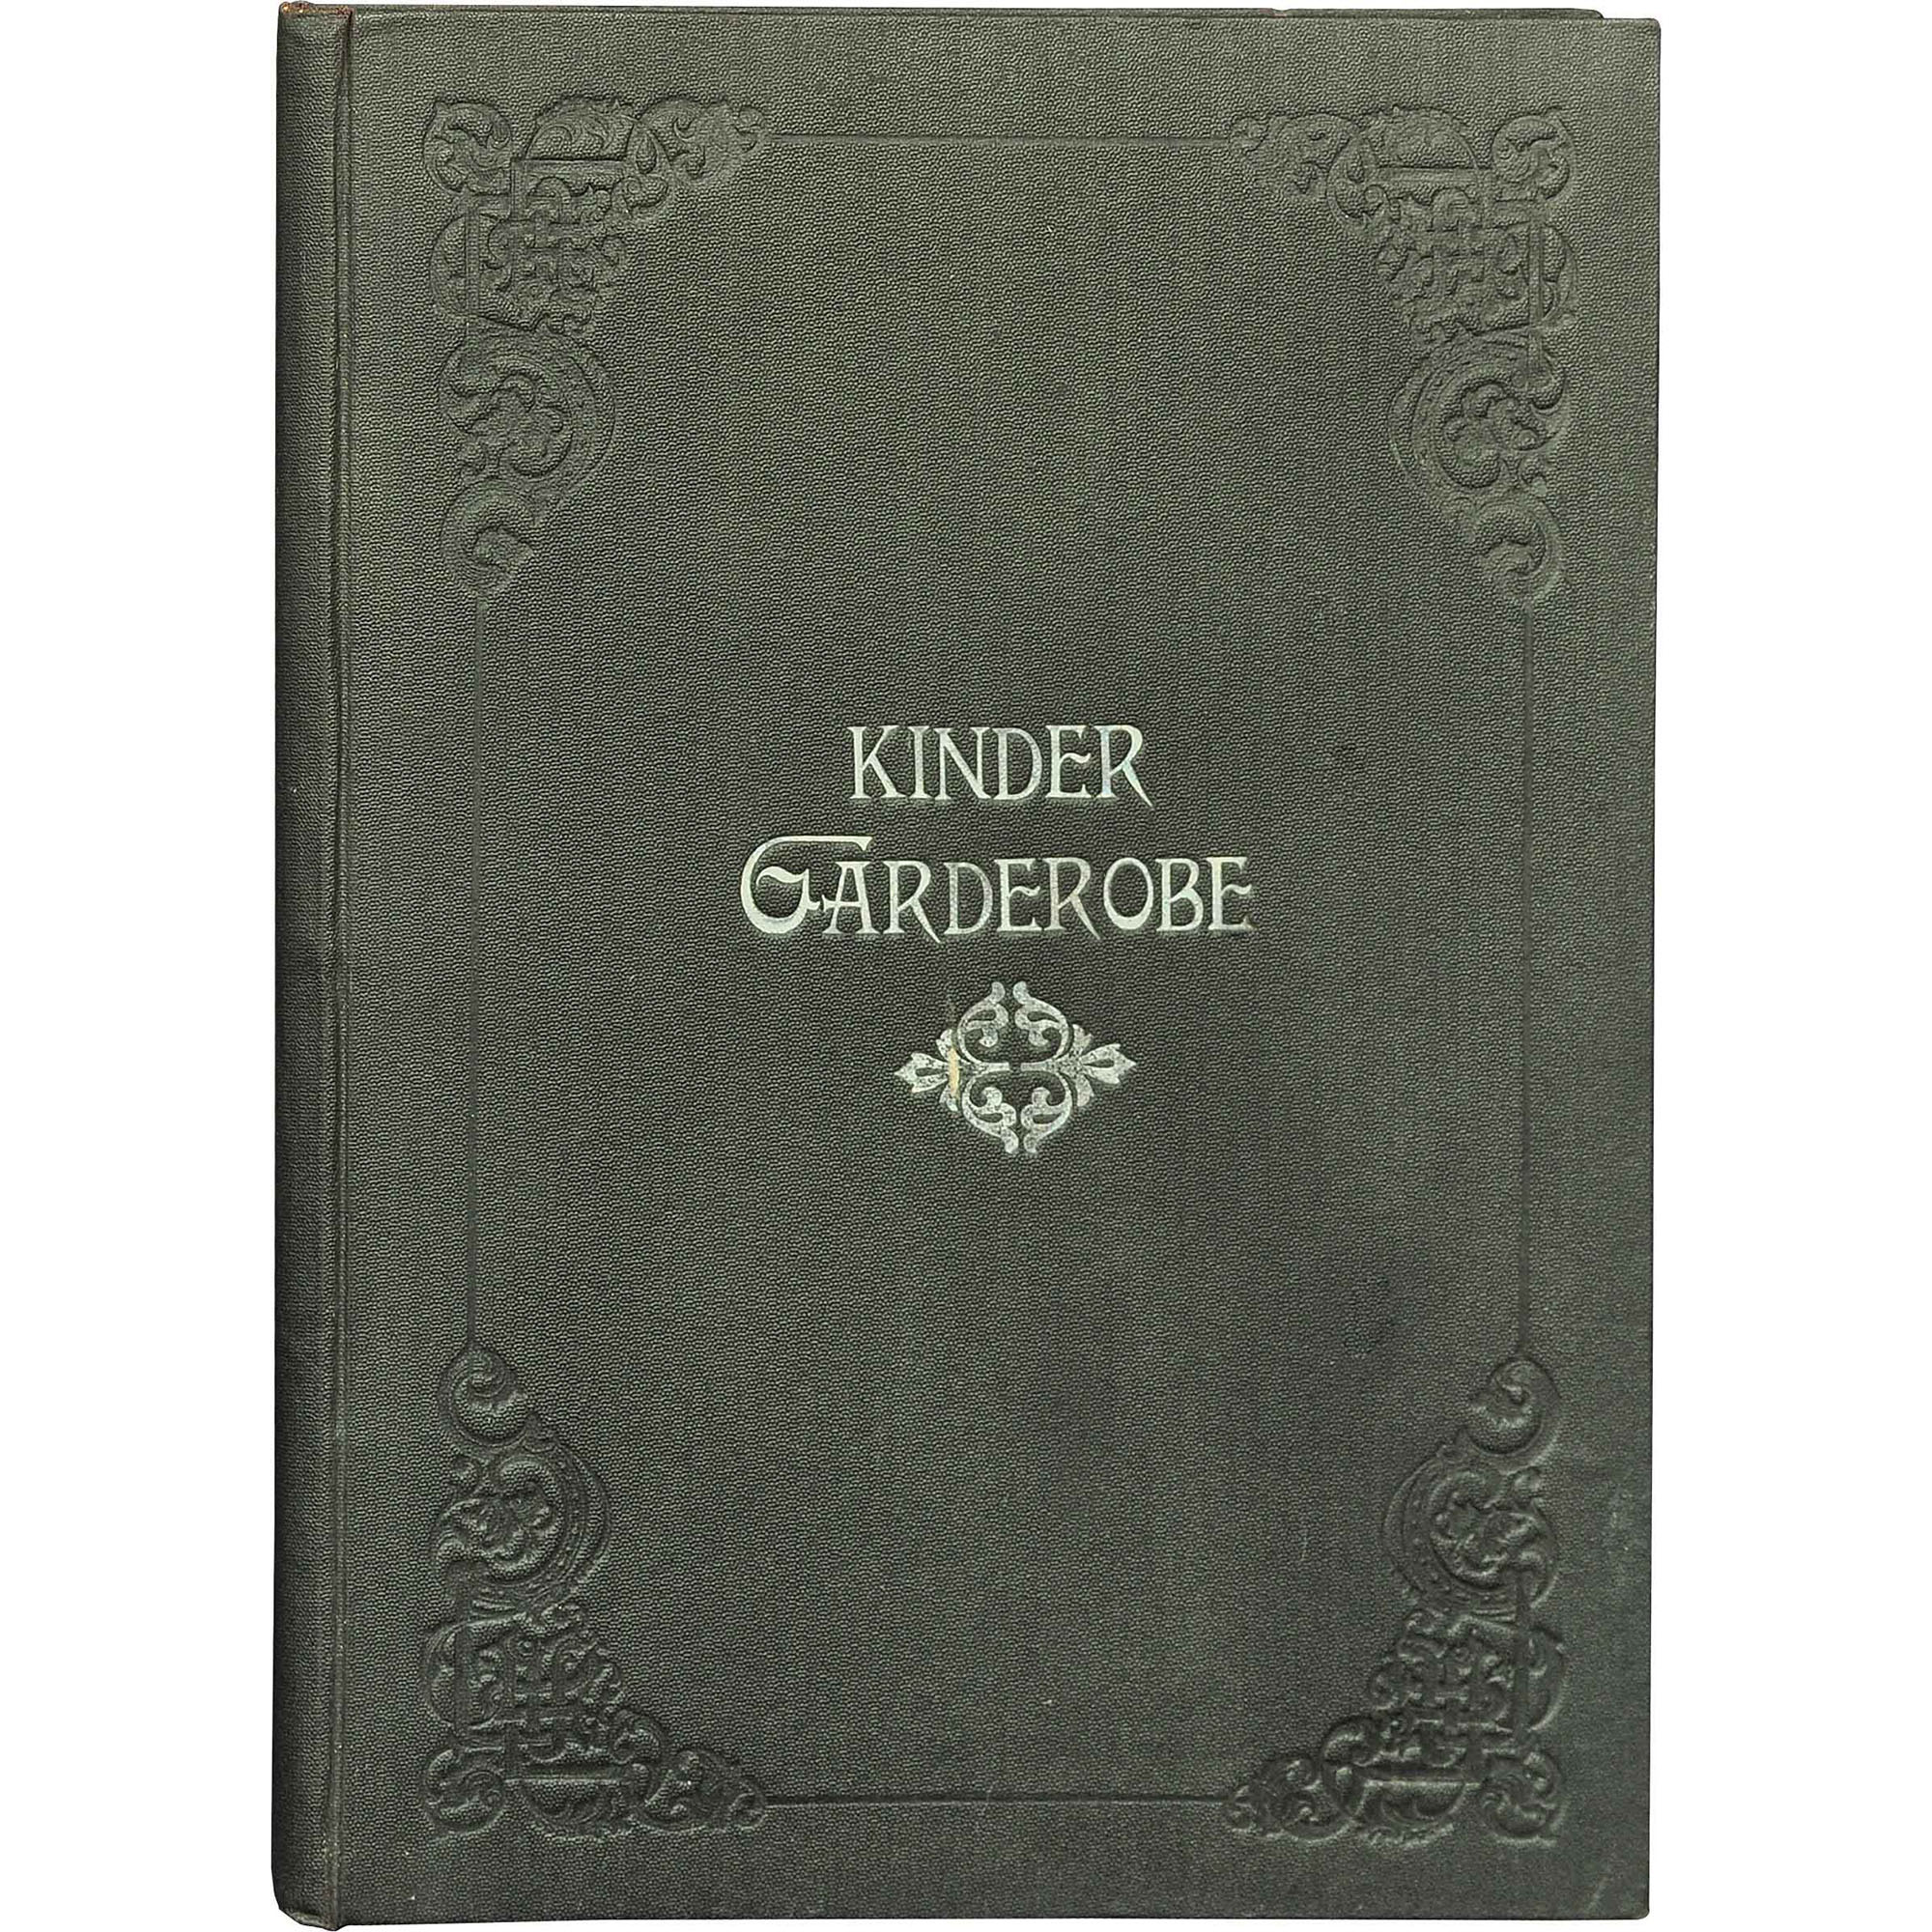 1141-Lechner-Kinder-Garderobe-1891-1-frei_.jpg